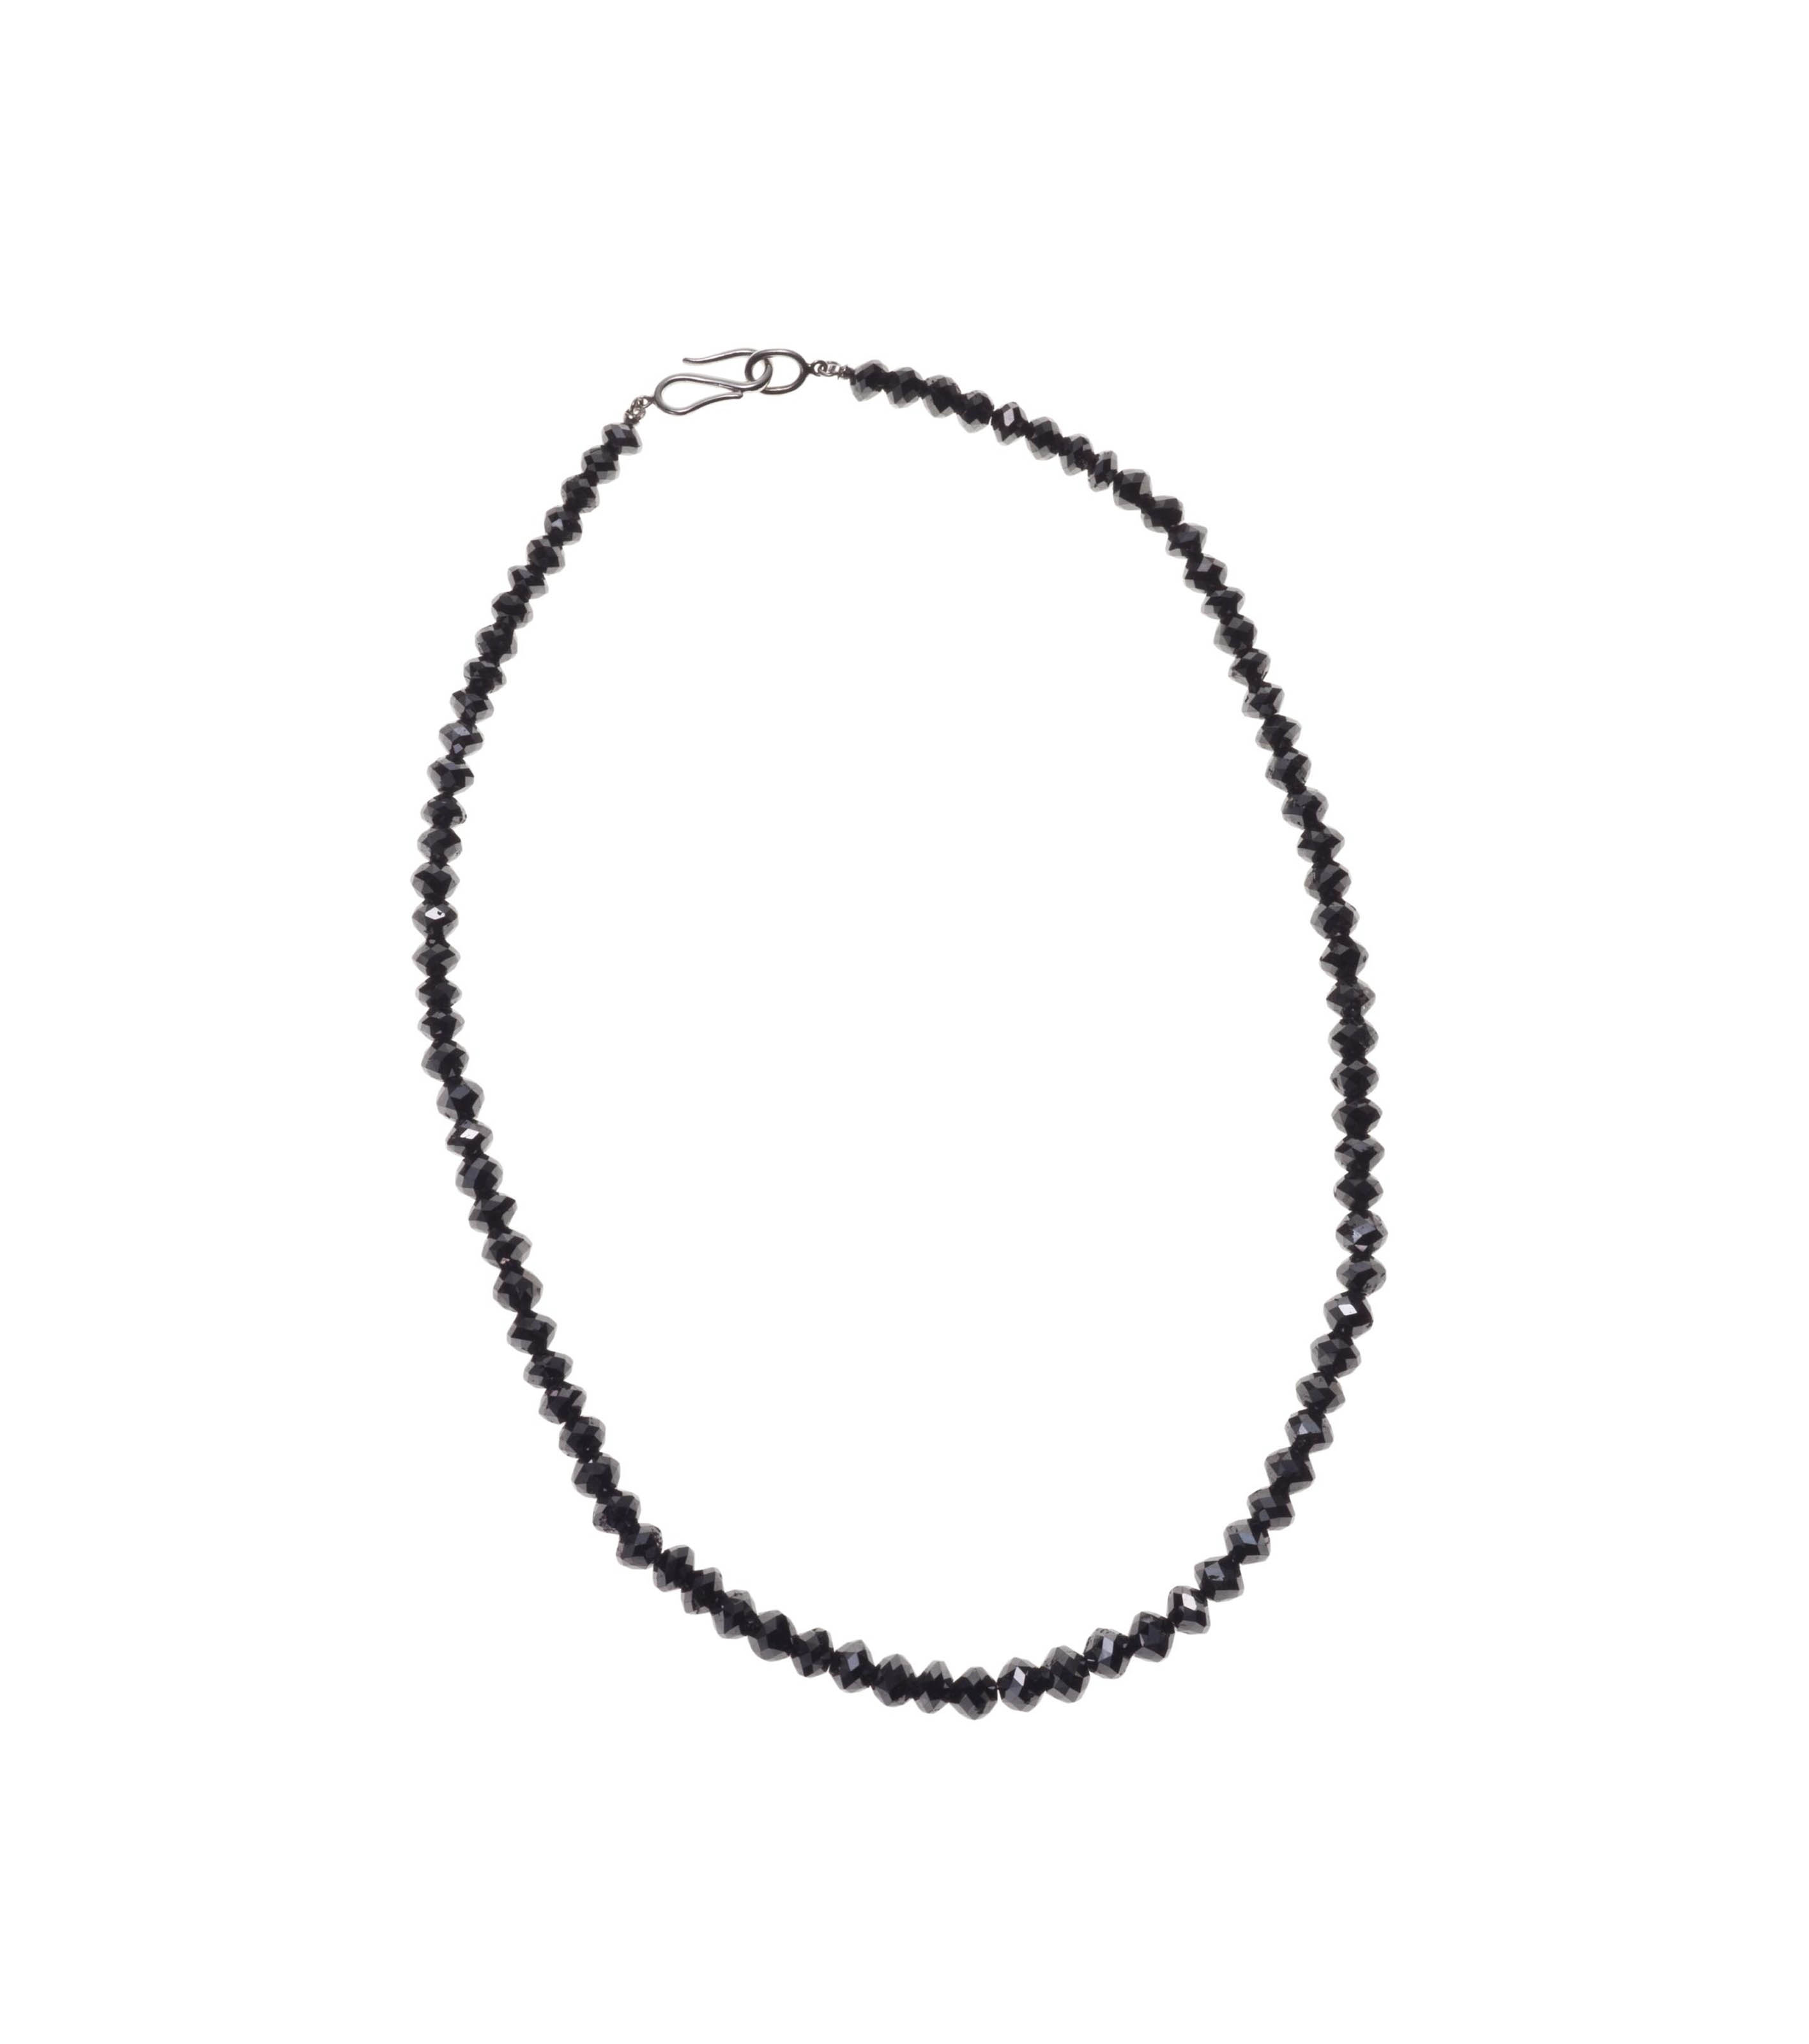 A COLORED DIAMOND NECKLACE, BY JULIUS COHEN